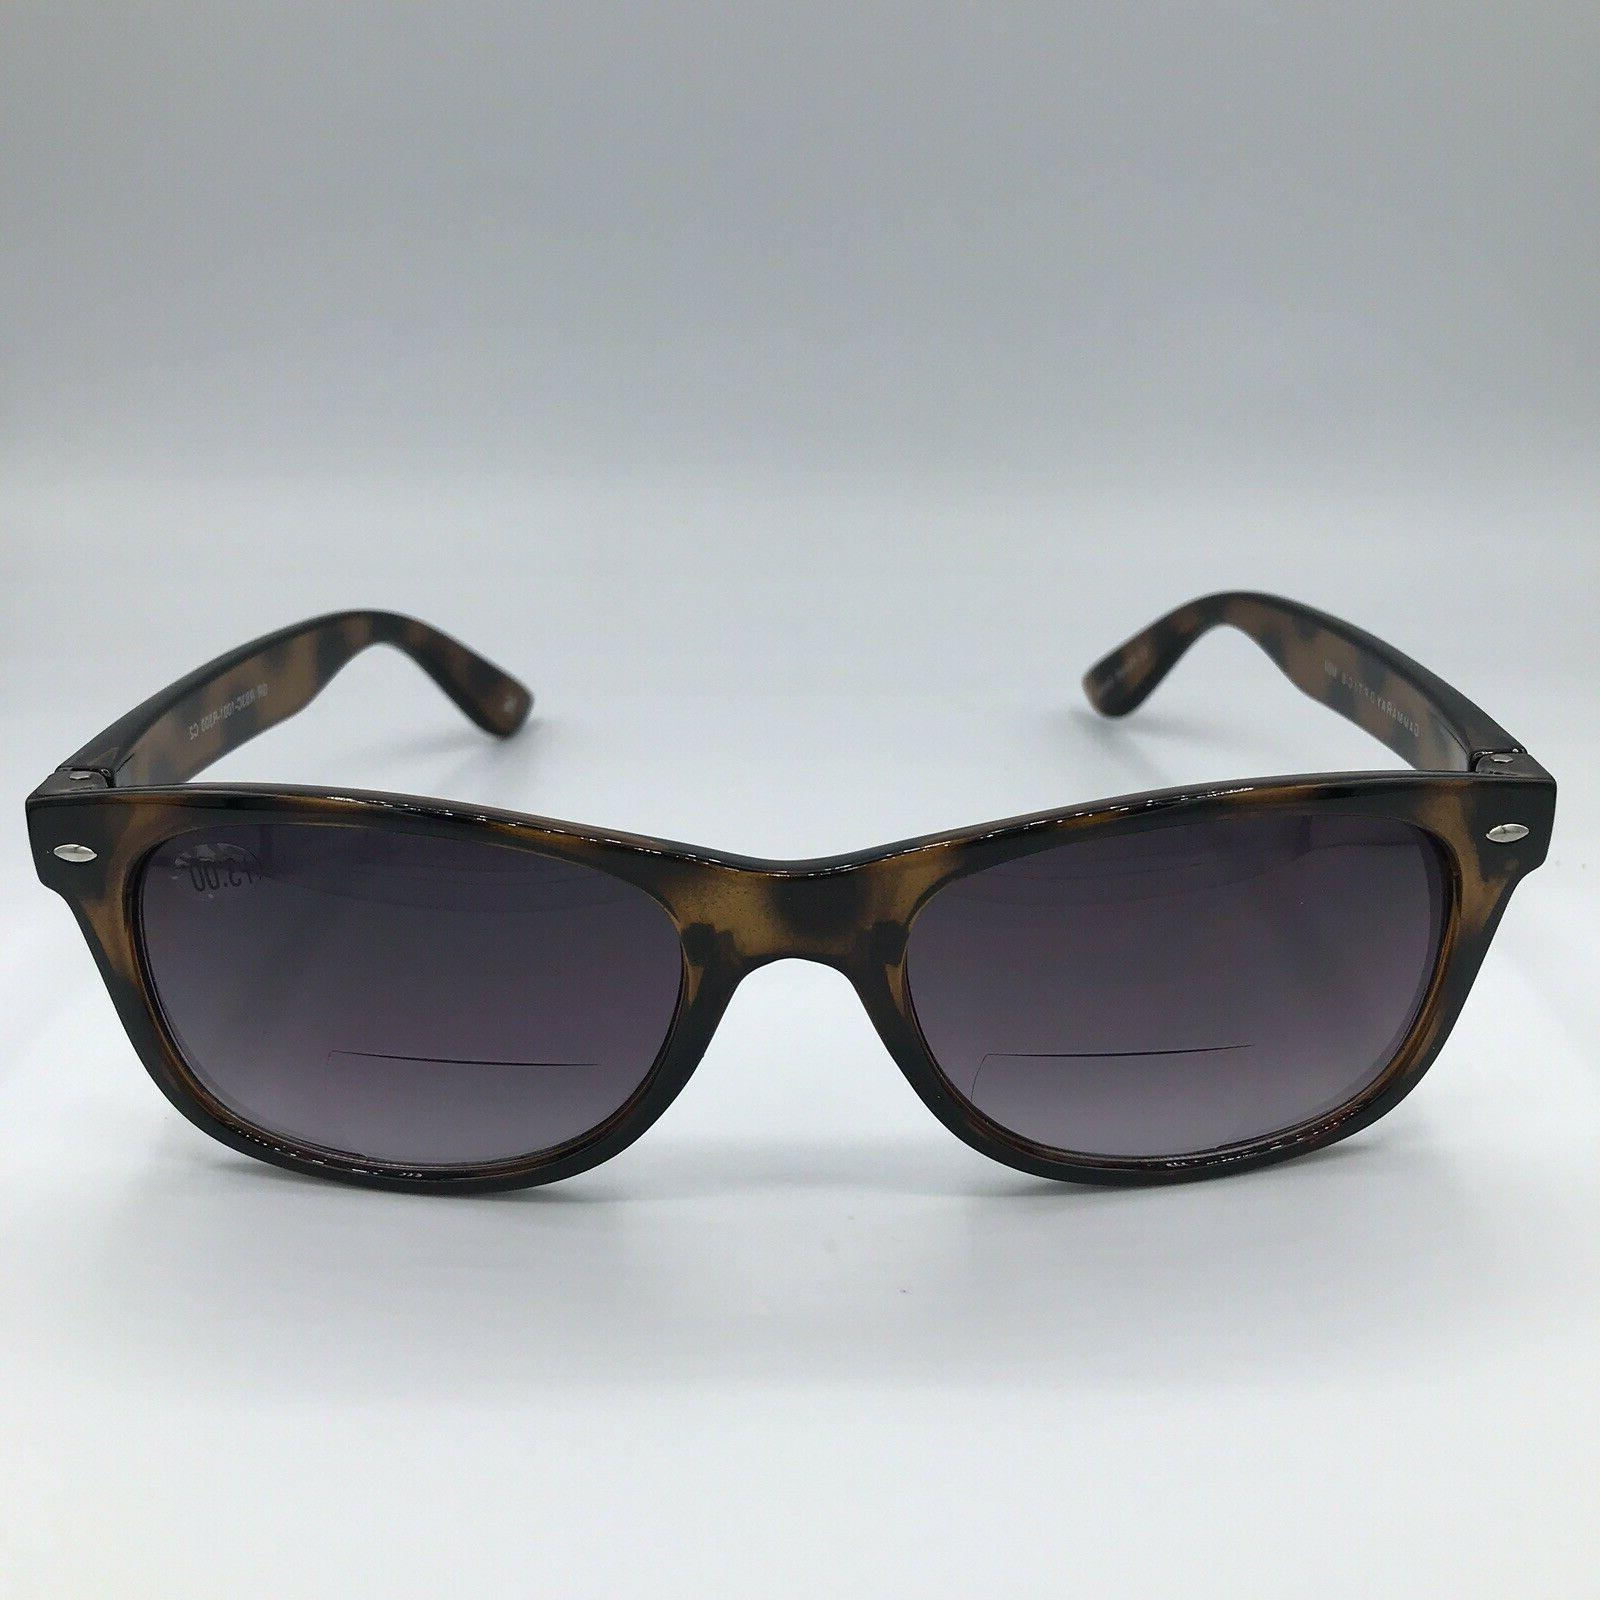 Gamma Sunglasses Brown Tortoise Outdoor Reading